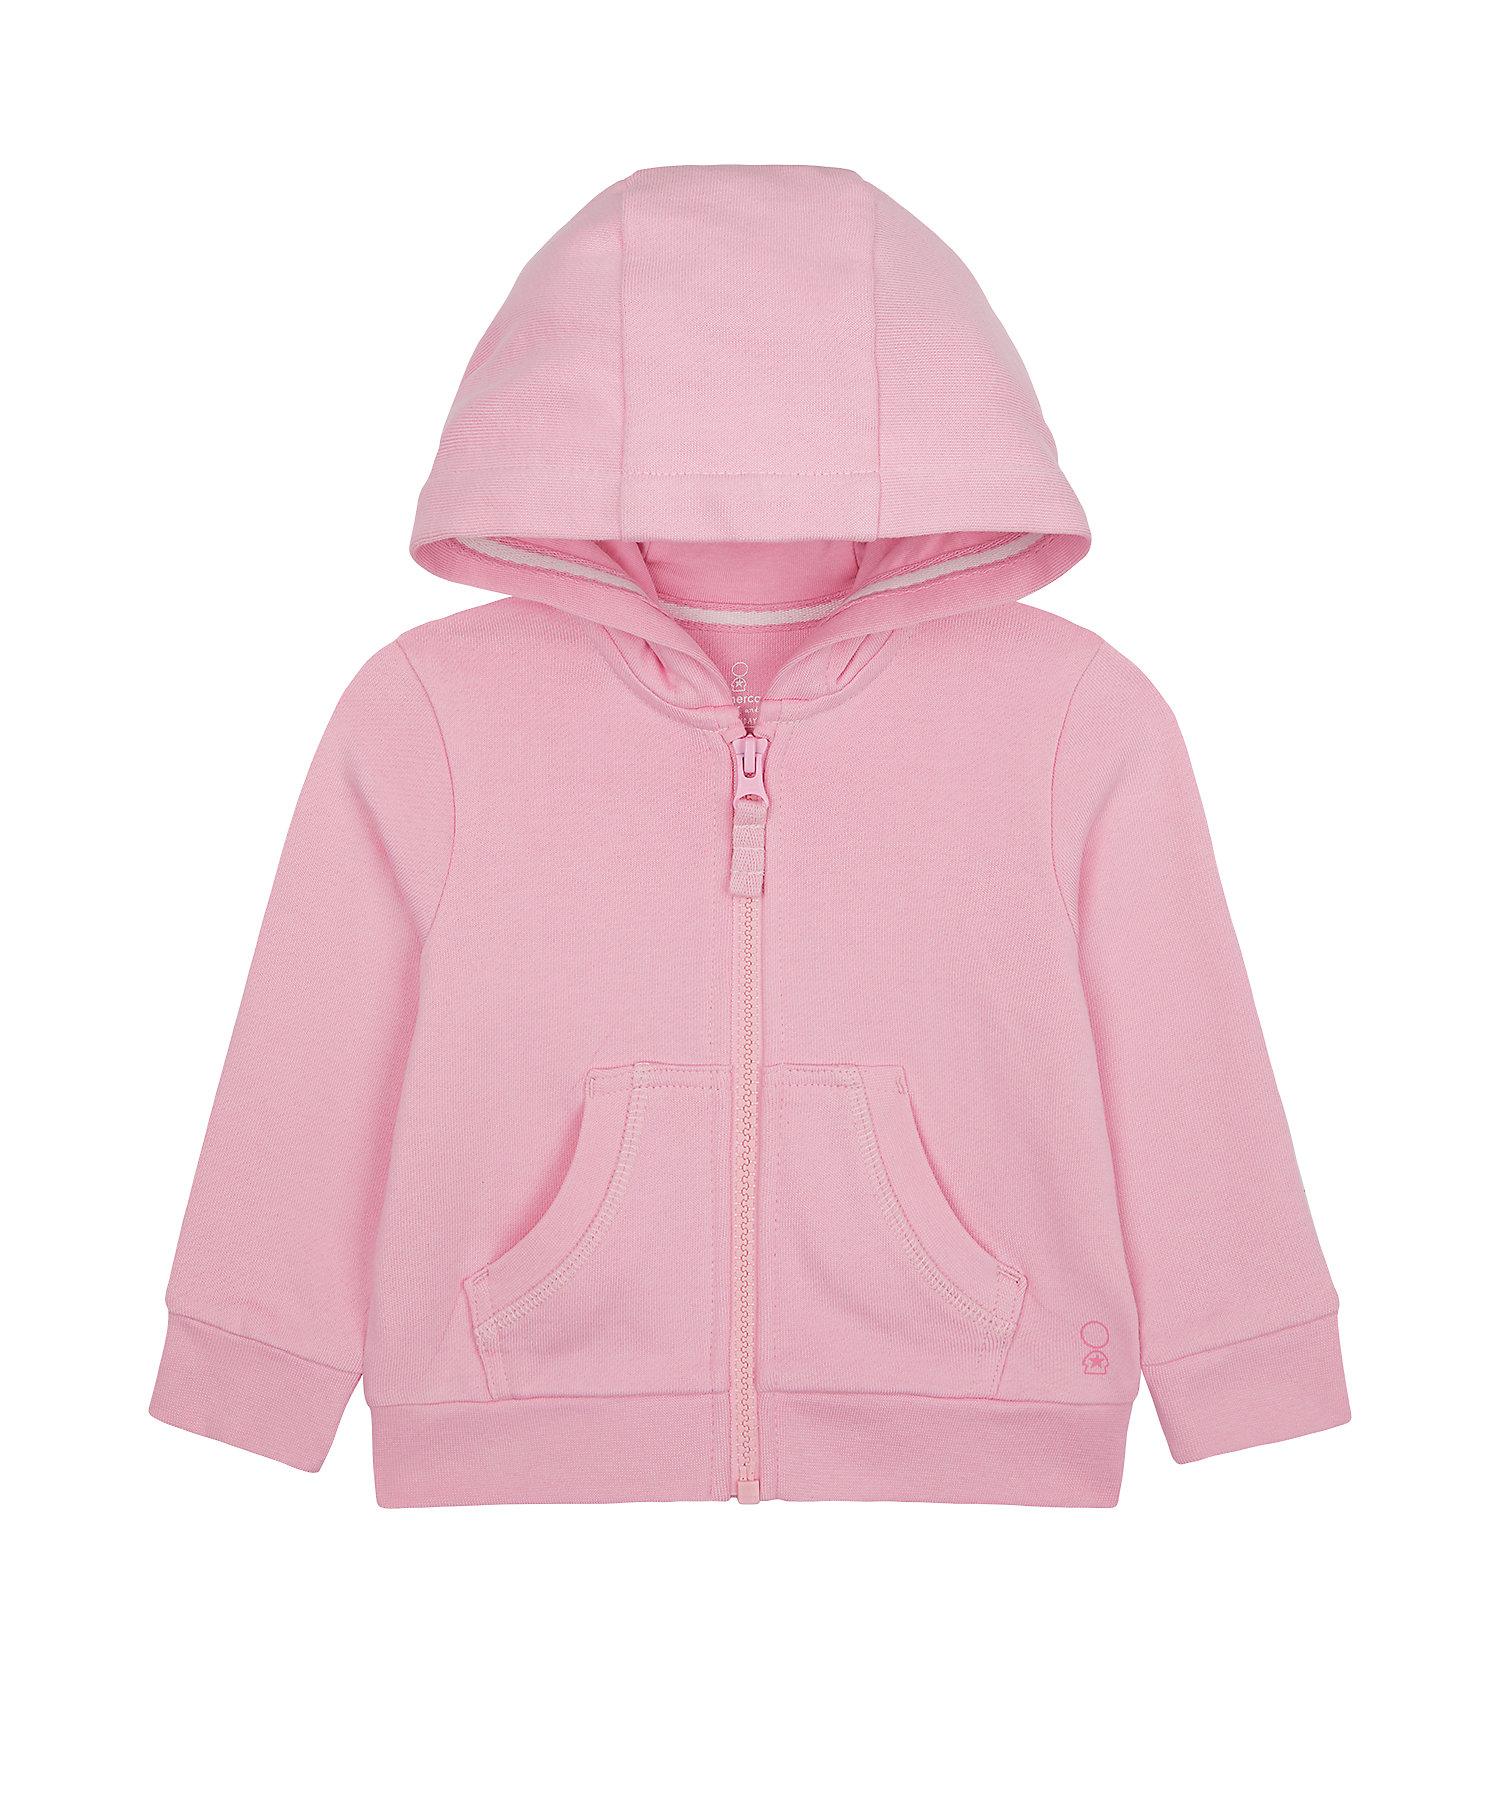 Mothercare | Girls Full Sleeves Hooded Sweatshirt Zip Through Opening - Pink